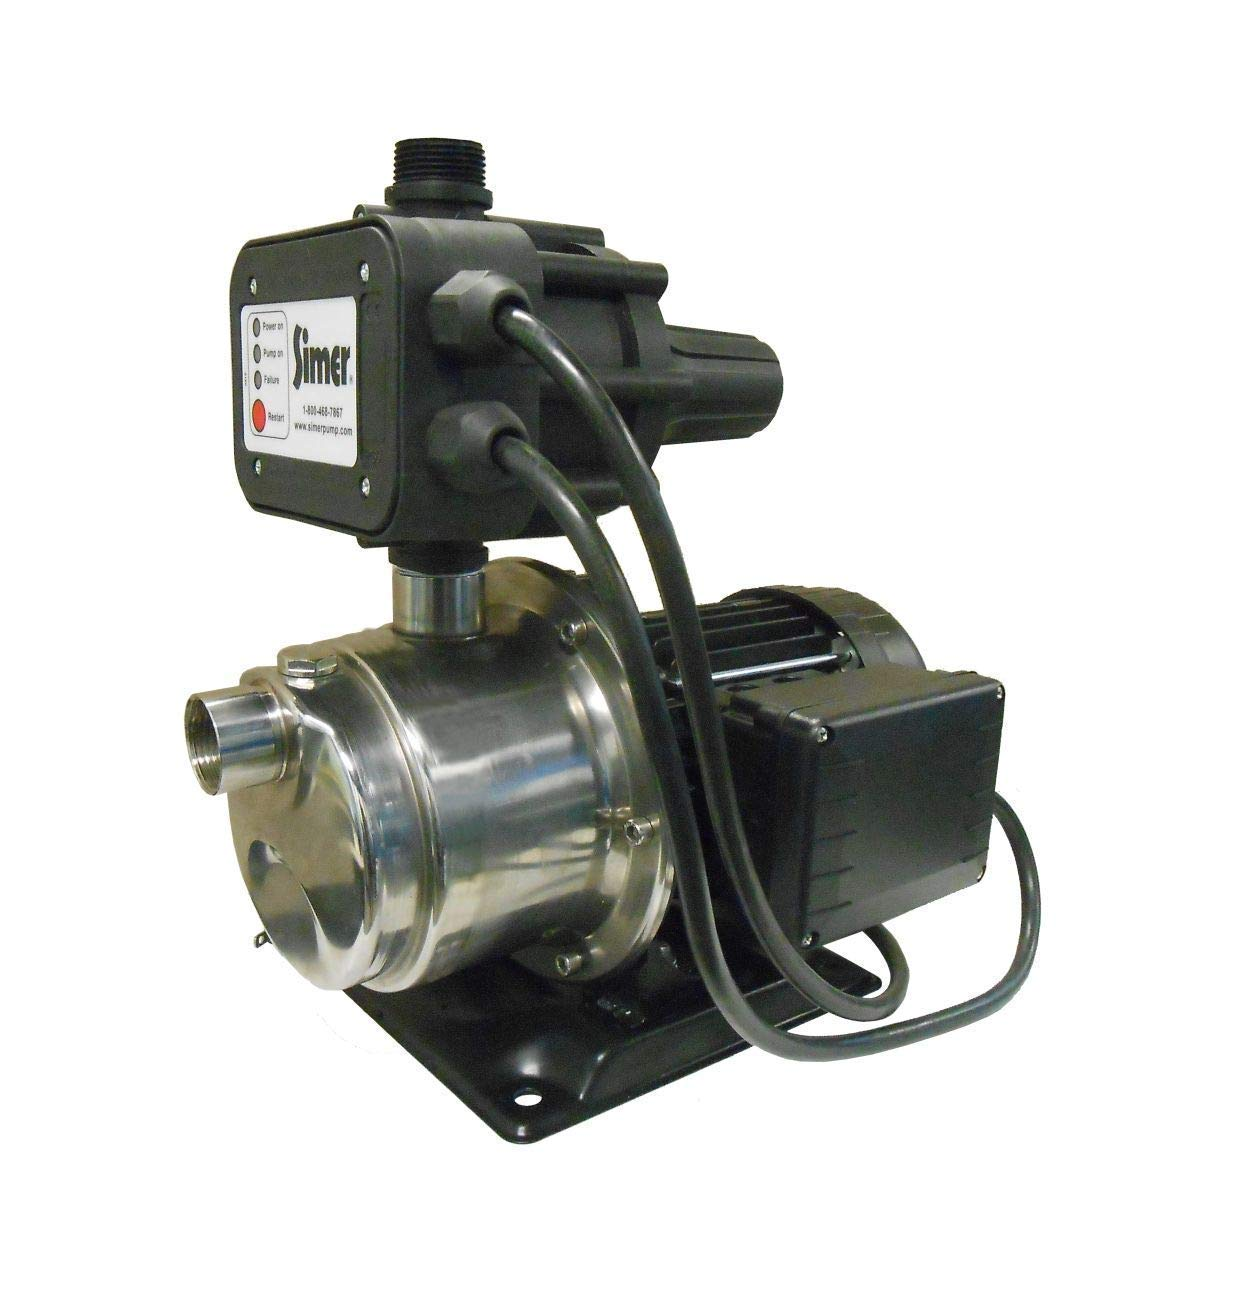 Simer 4075SS-01 3/4 HP Pressure Booster Pump